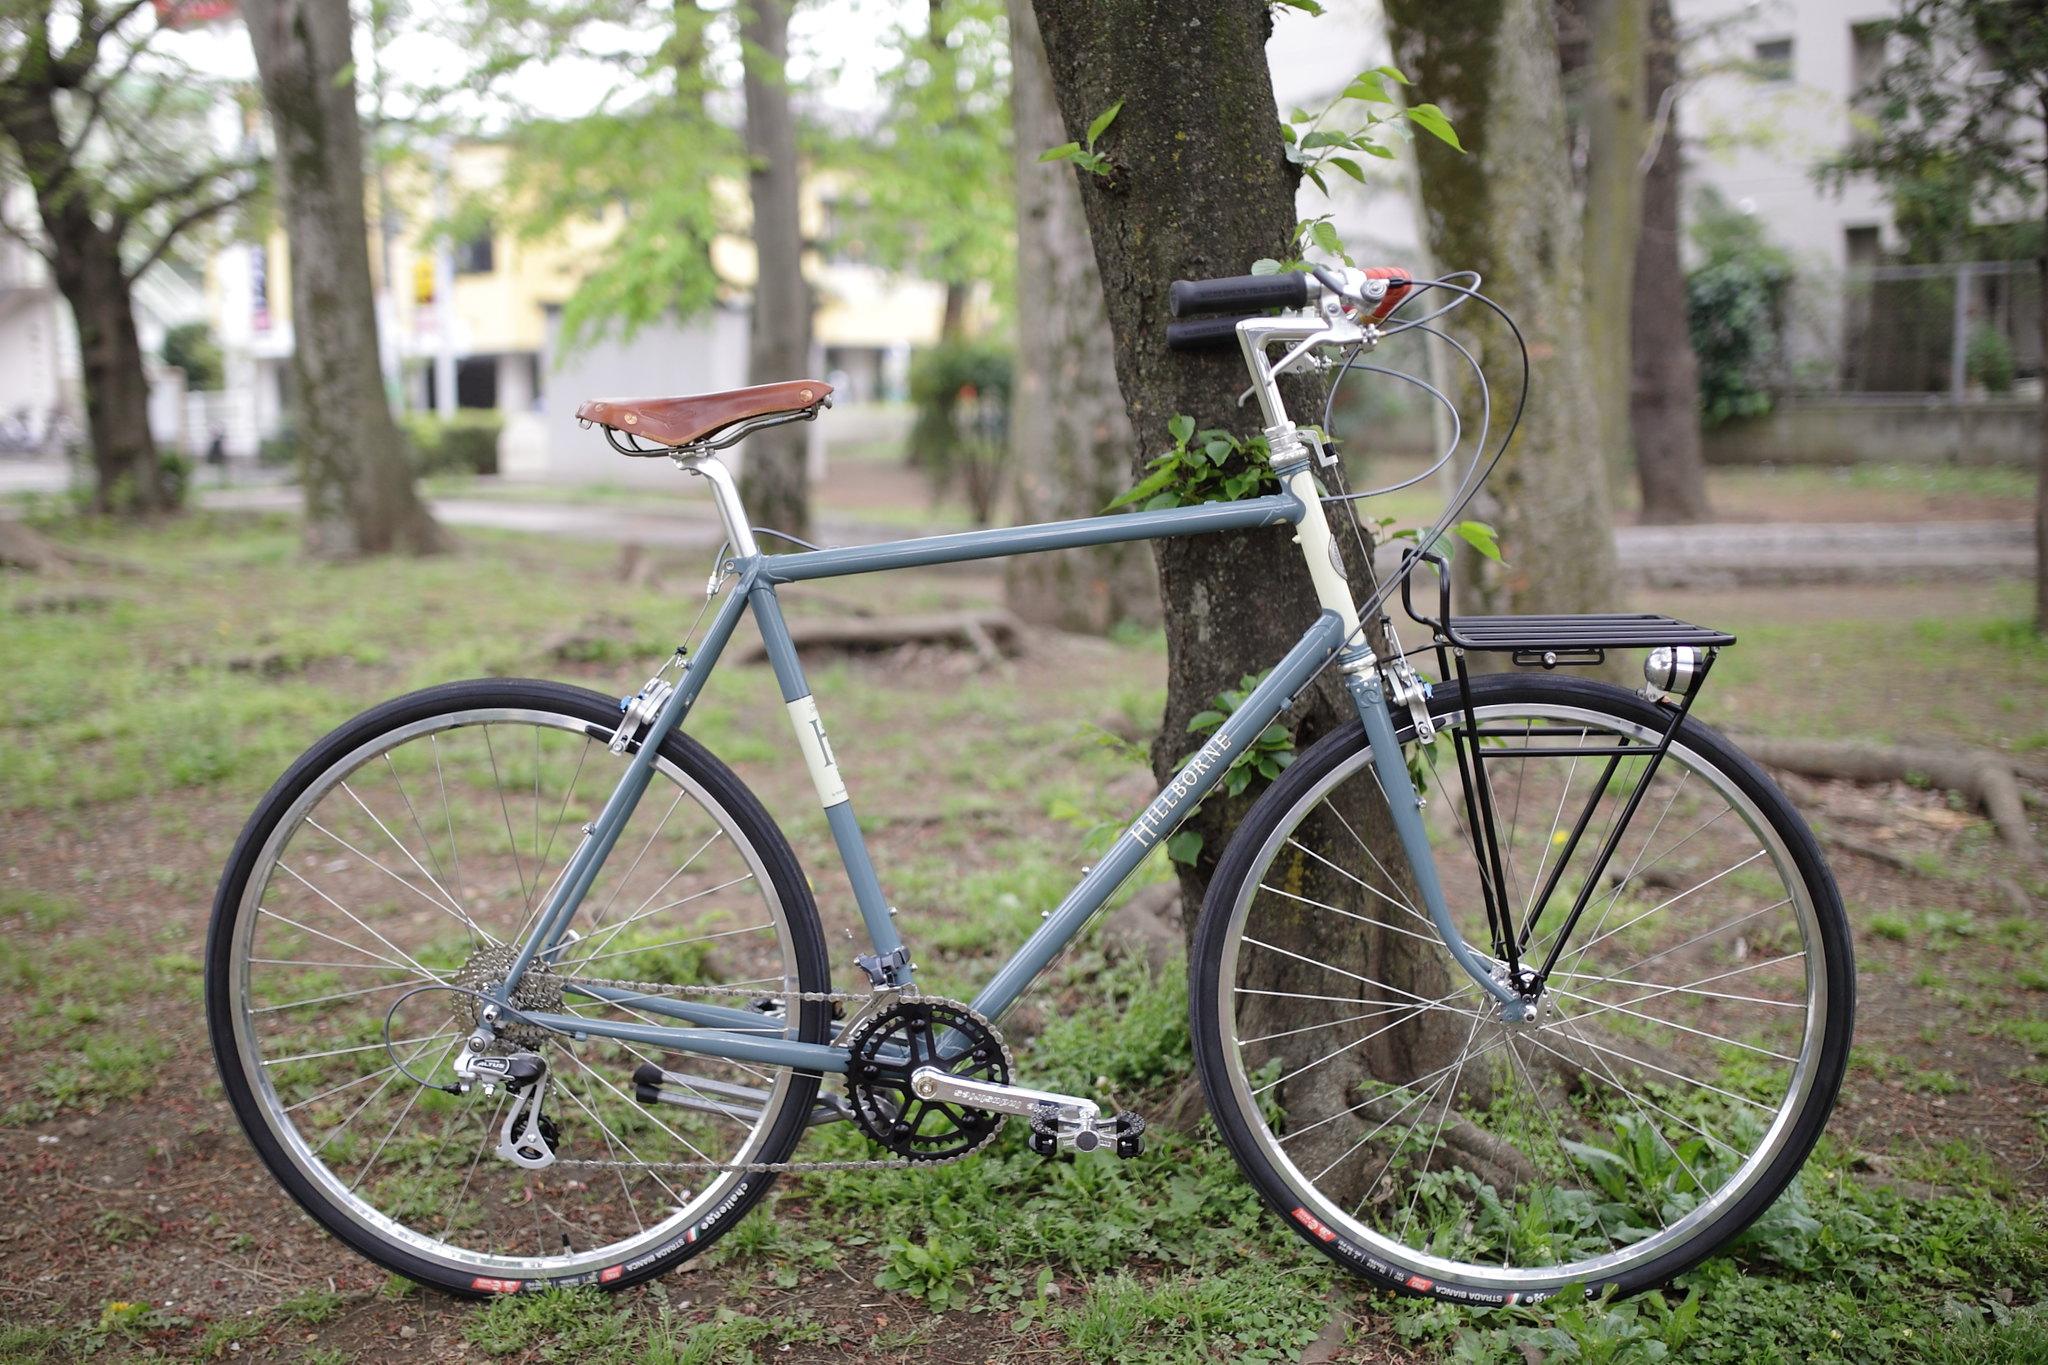 *RIVENDELL*sam hillborne complete bike BLUE LUG custom